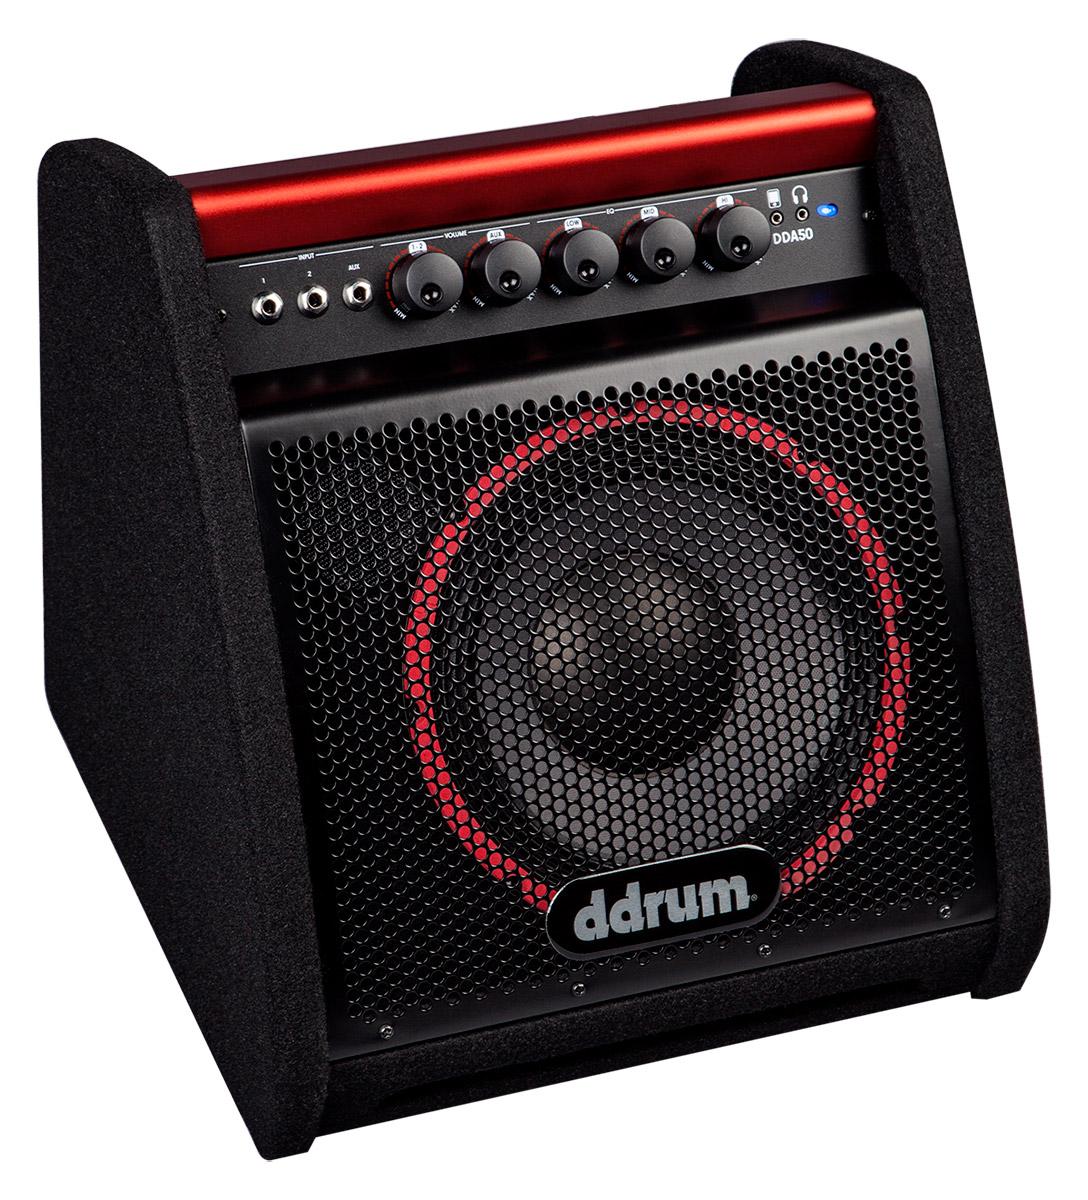 Ddrum DDA50 Electronic Percussion Amplifier